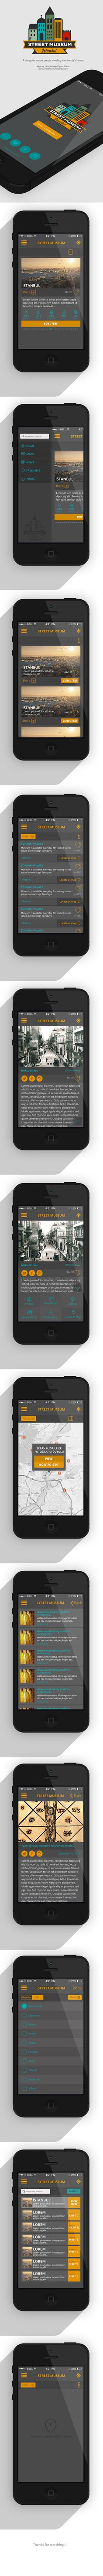 Istanbul Street Museum IOS App on Behance #history #museum #design #yildirim #ui #istanbul #yasemin #mobile #street #ios